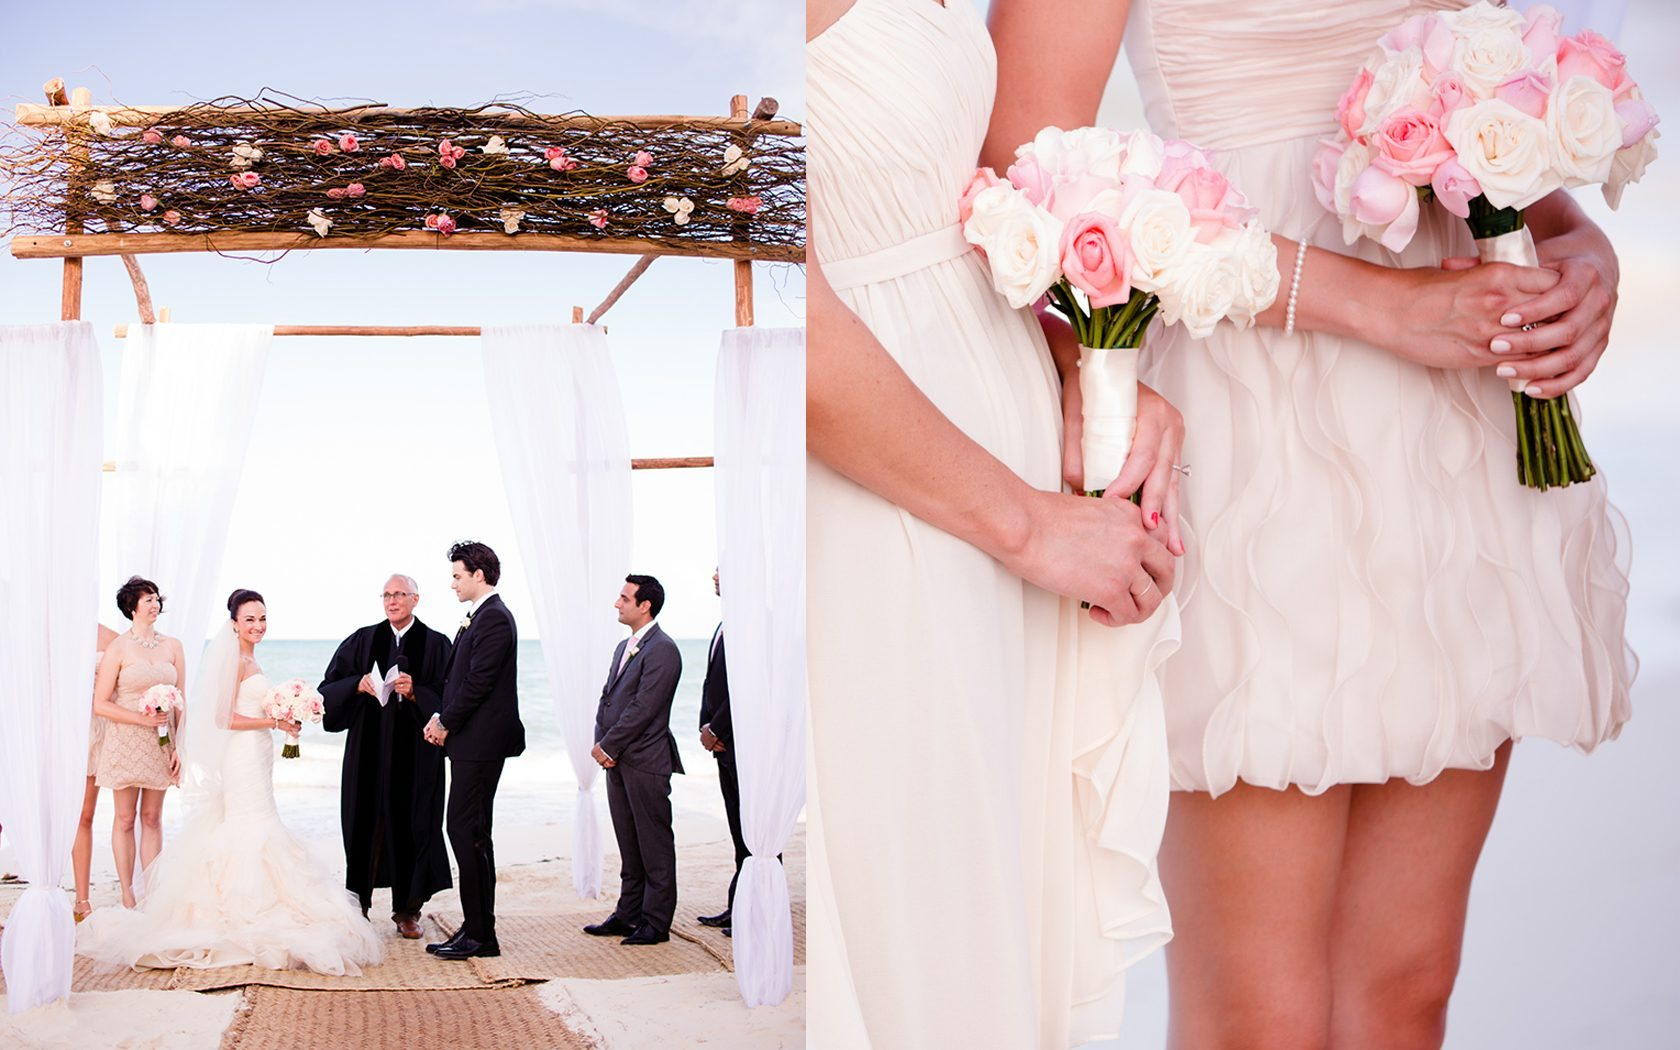 Fairmont_Mayakoba_Wedding_050-1680x1050.jpg